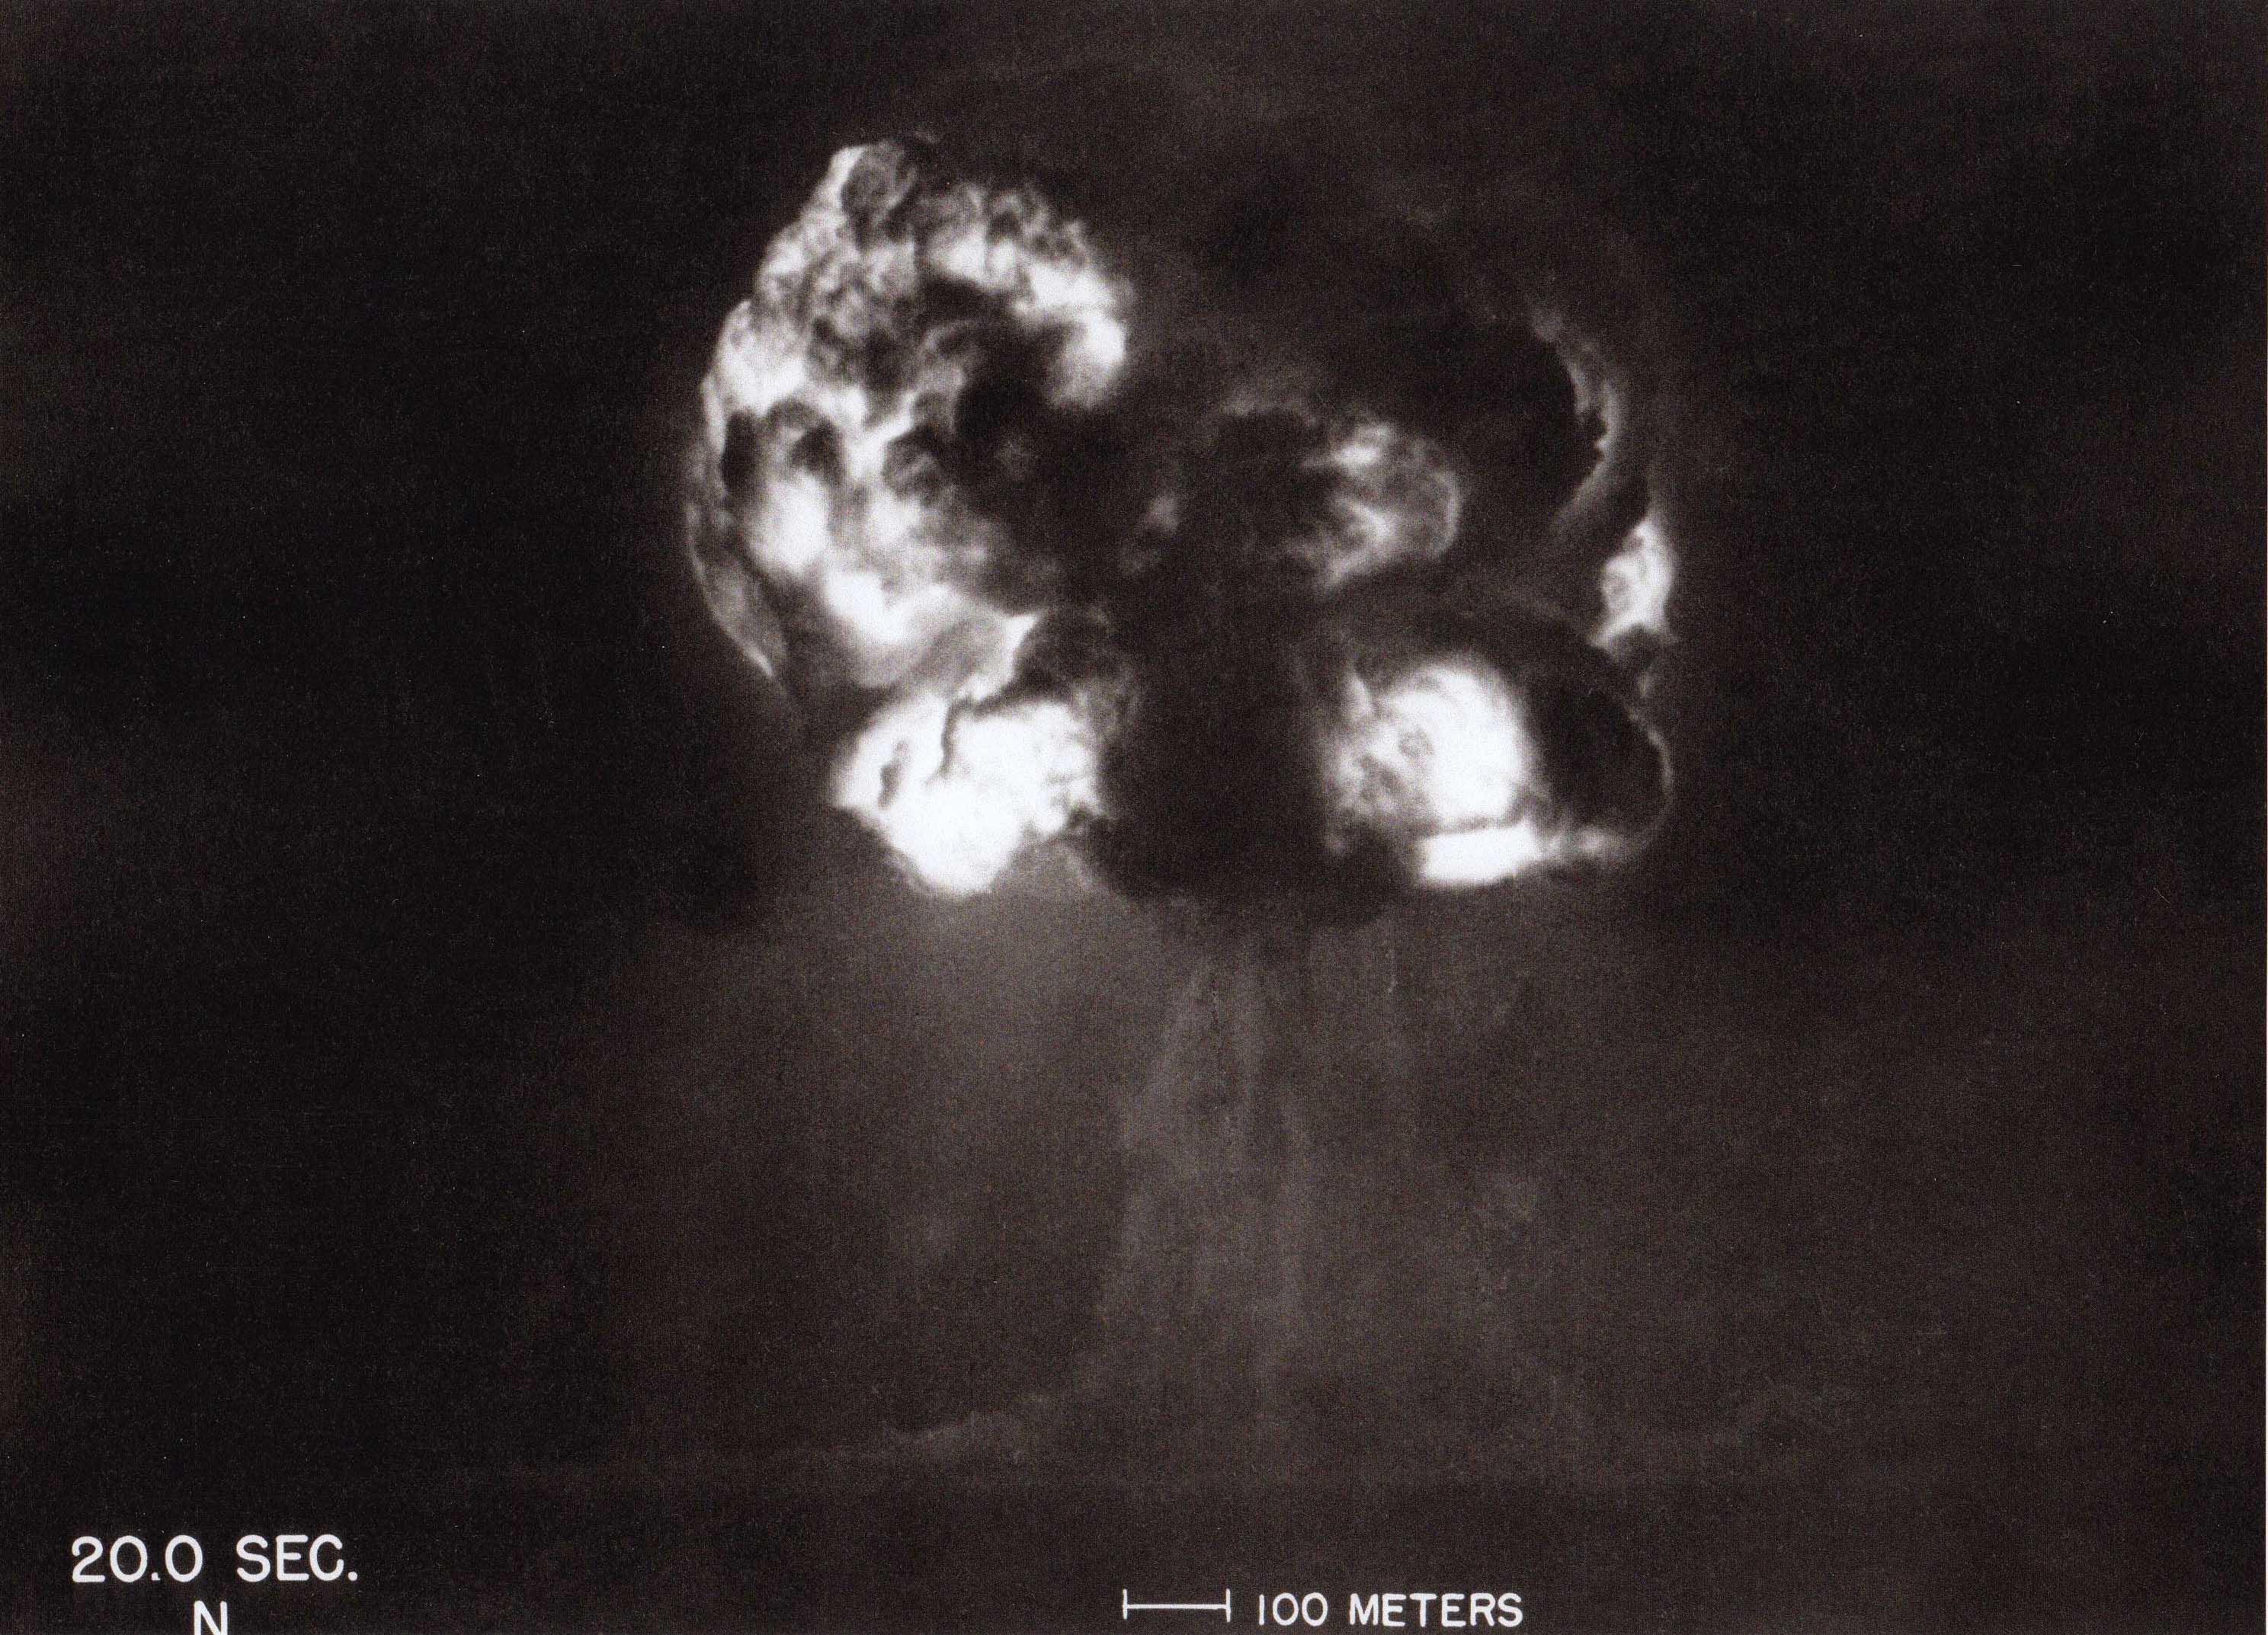 Trinity Detonation 20.0 seconds